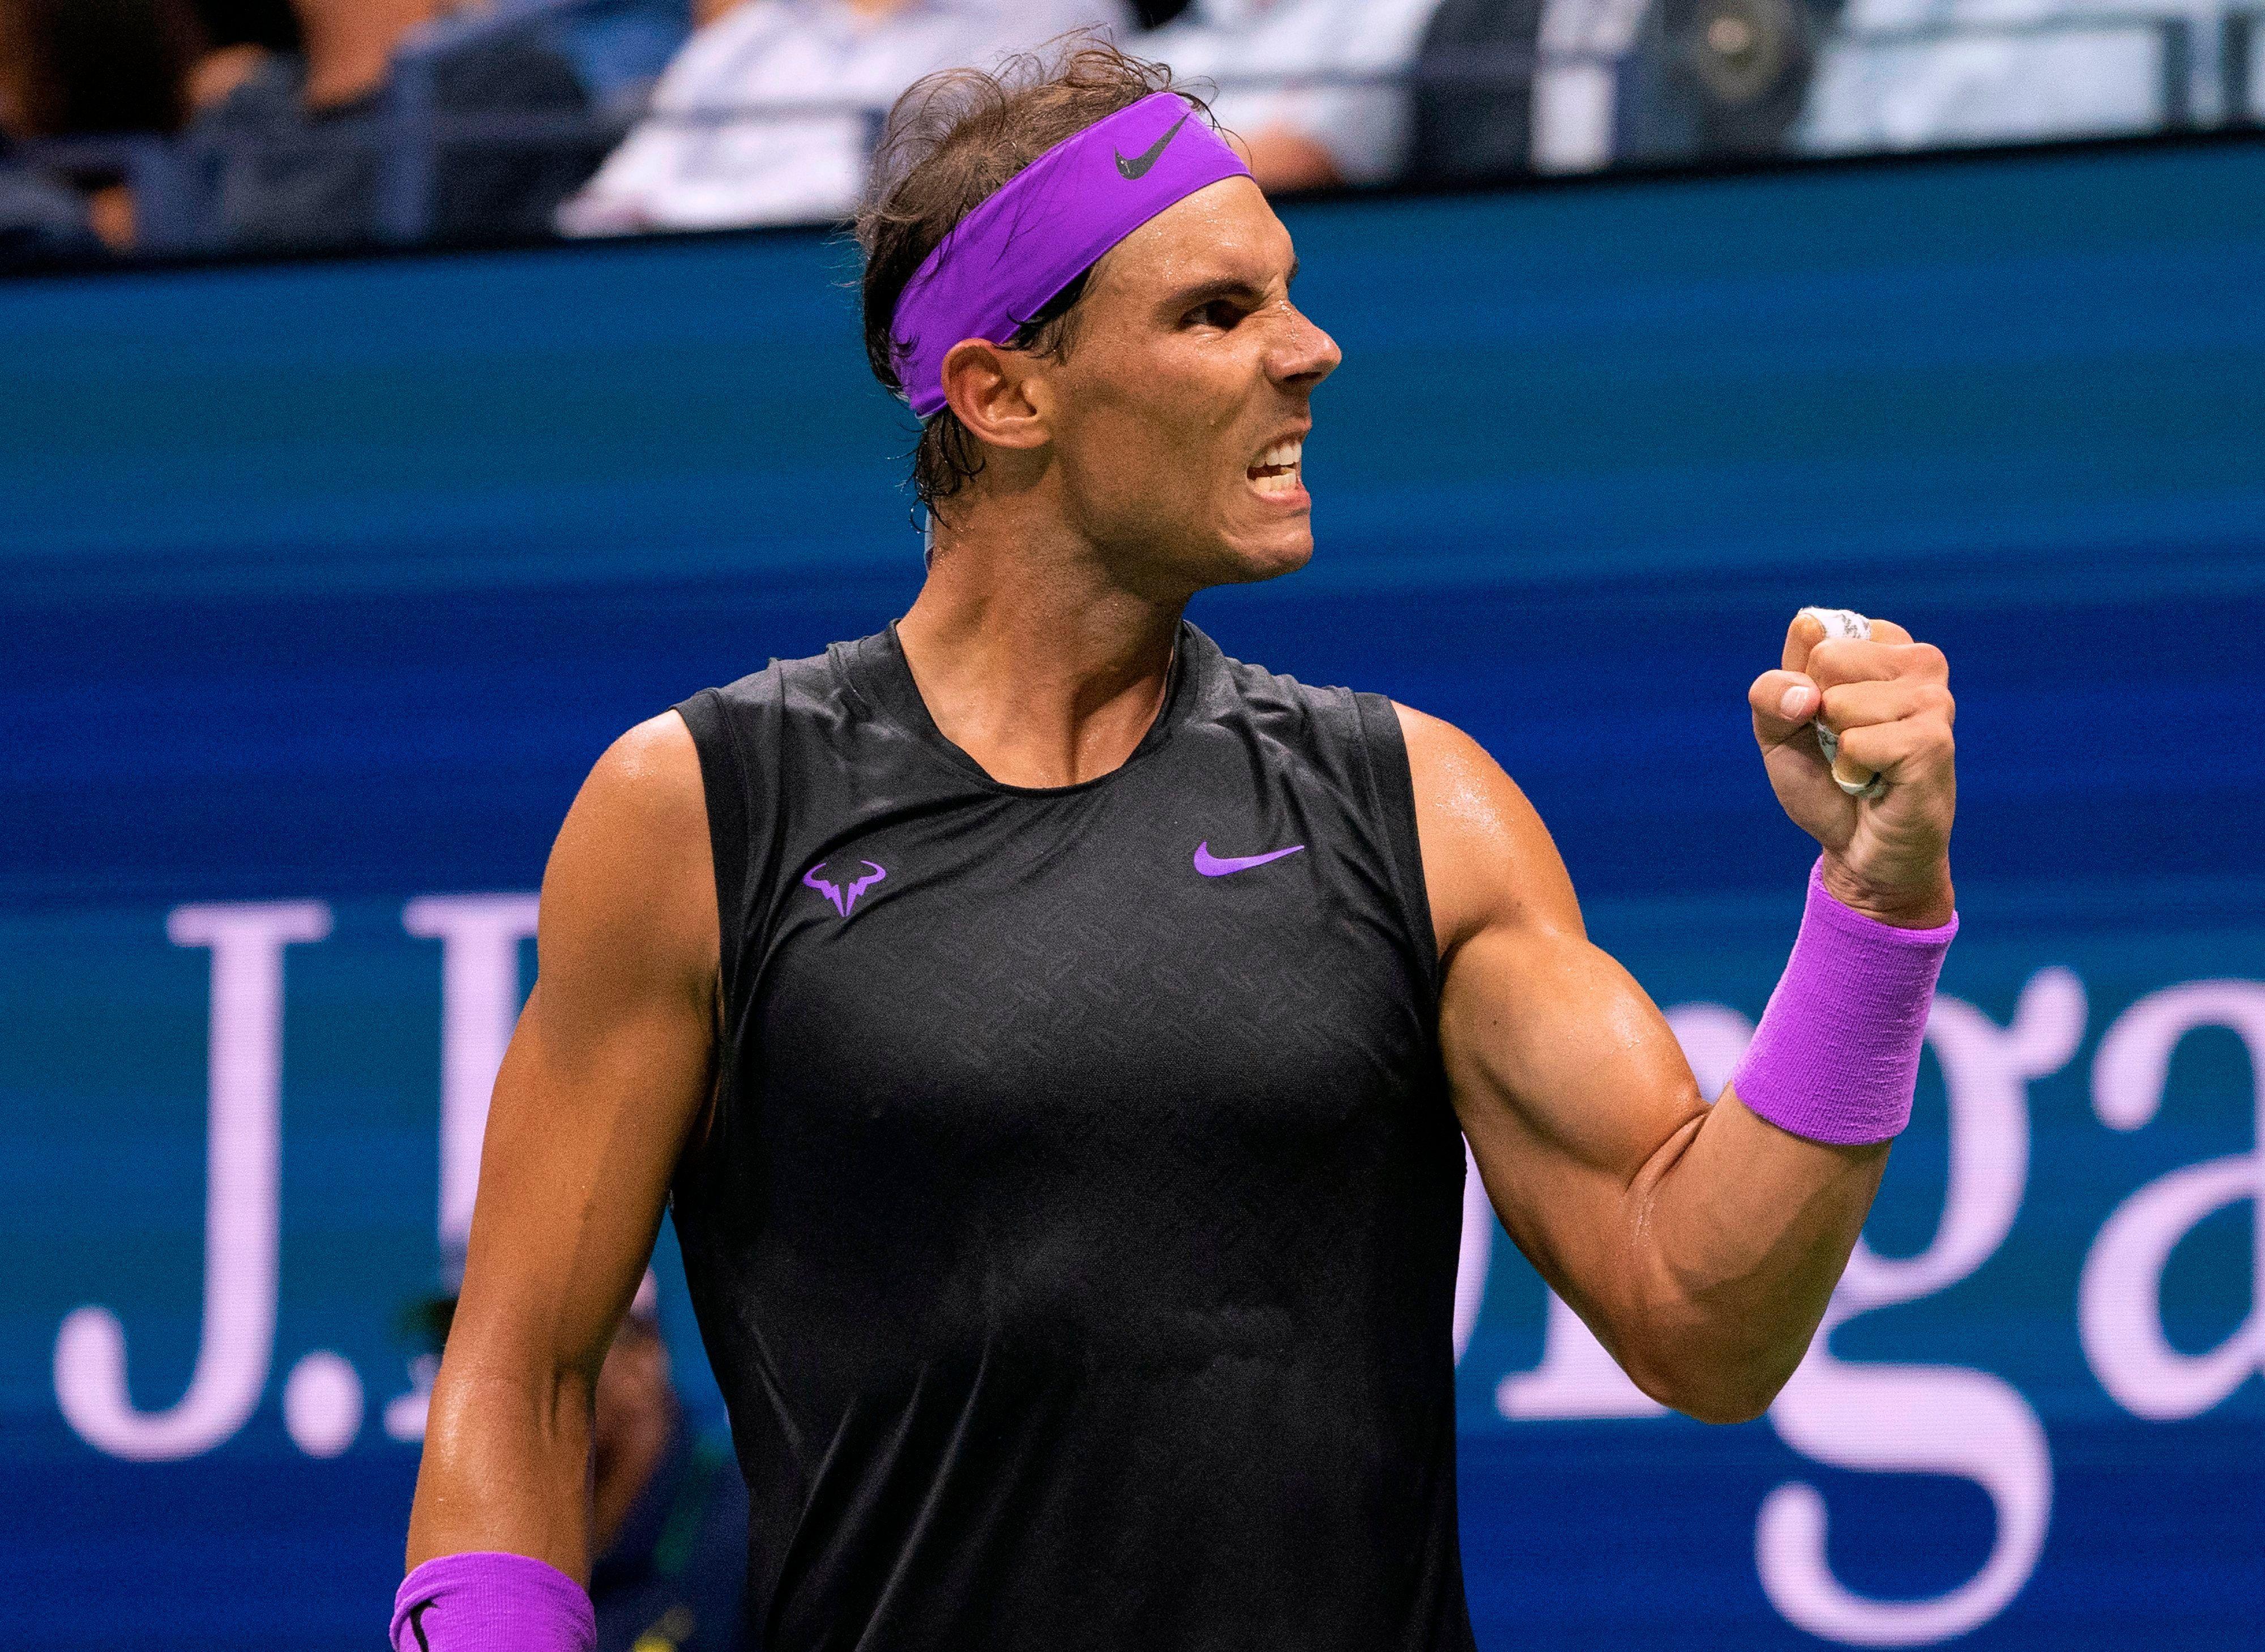 2019 Us Open Qf Rafael Nadal Vs Diego Schwartzman Rafa Nadal Rafael Nadal Tennis Champion